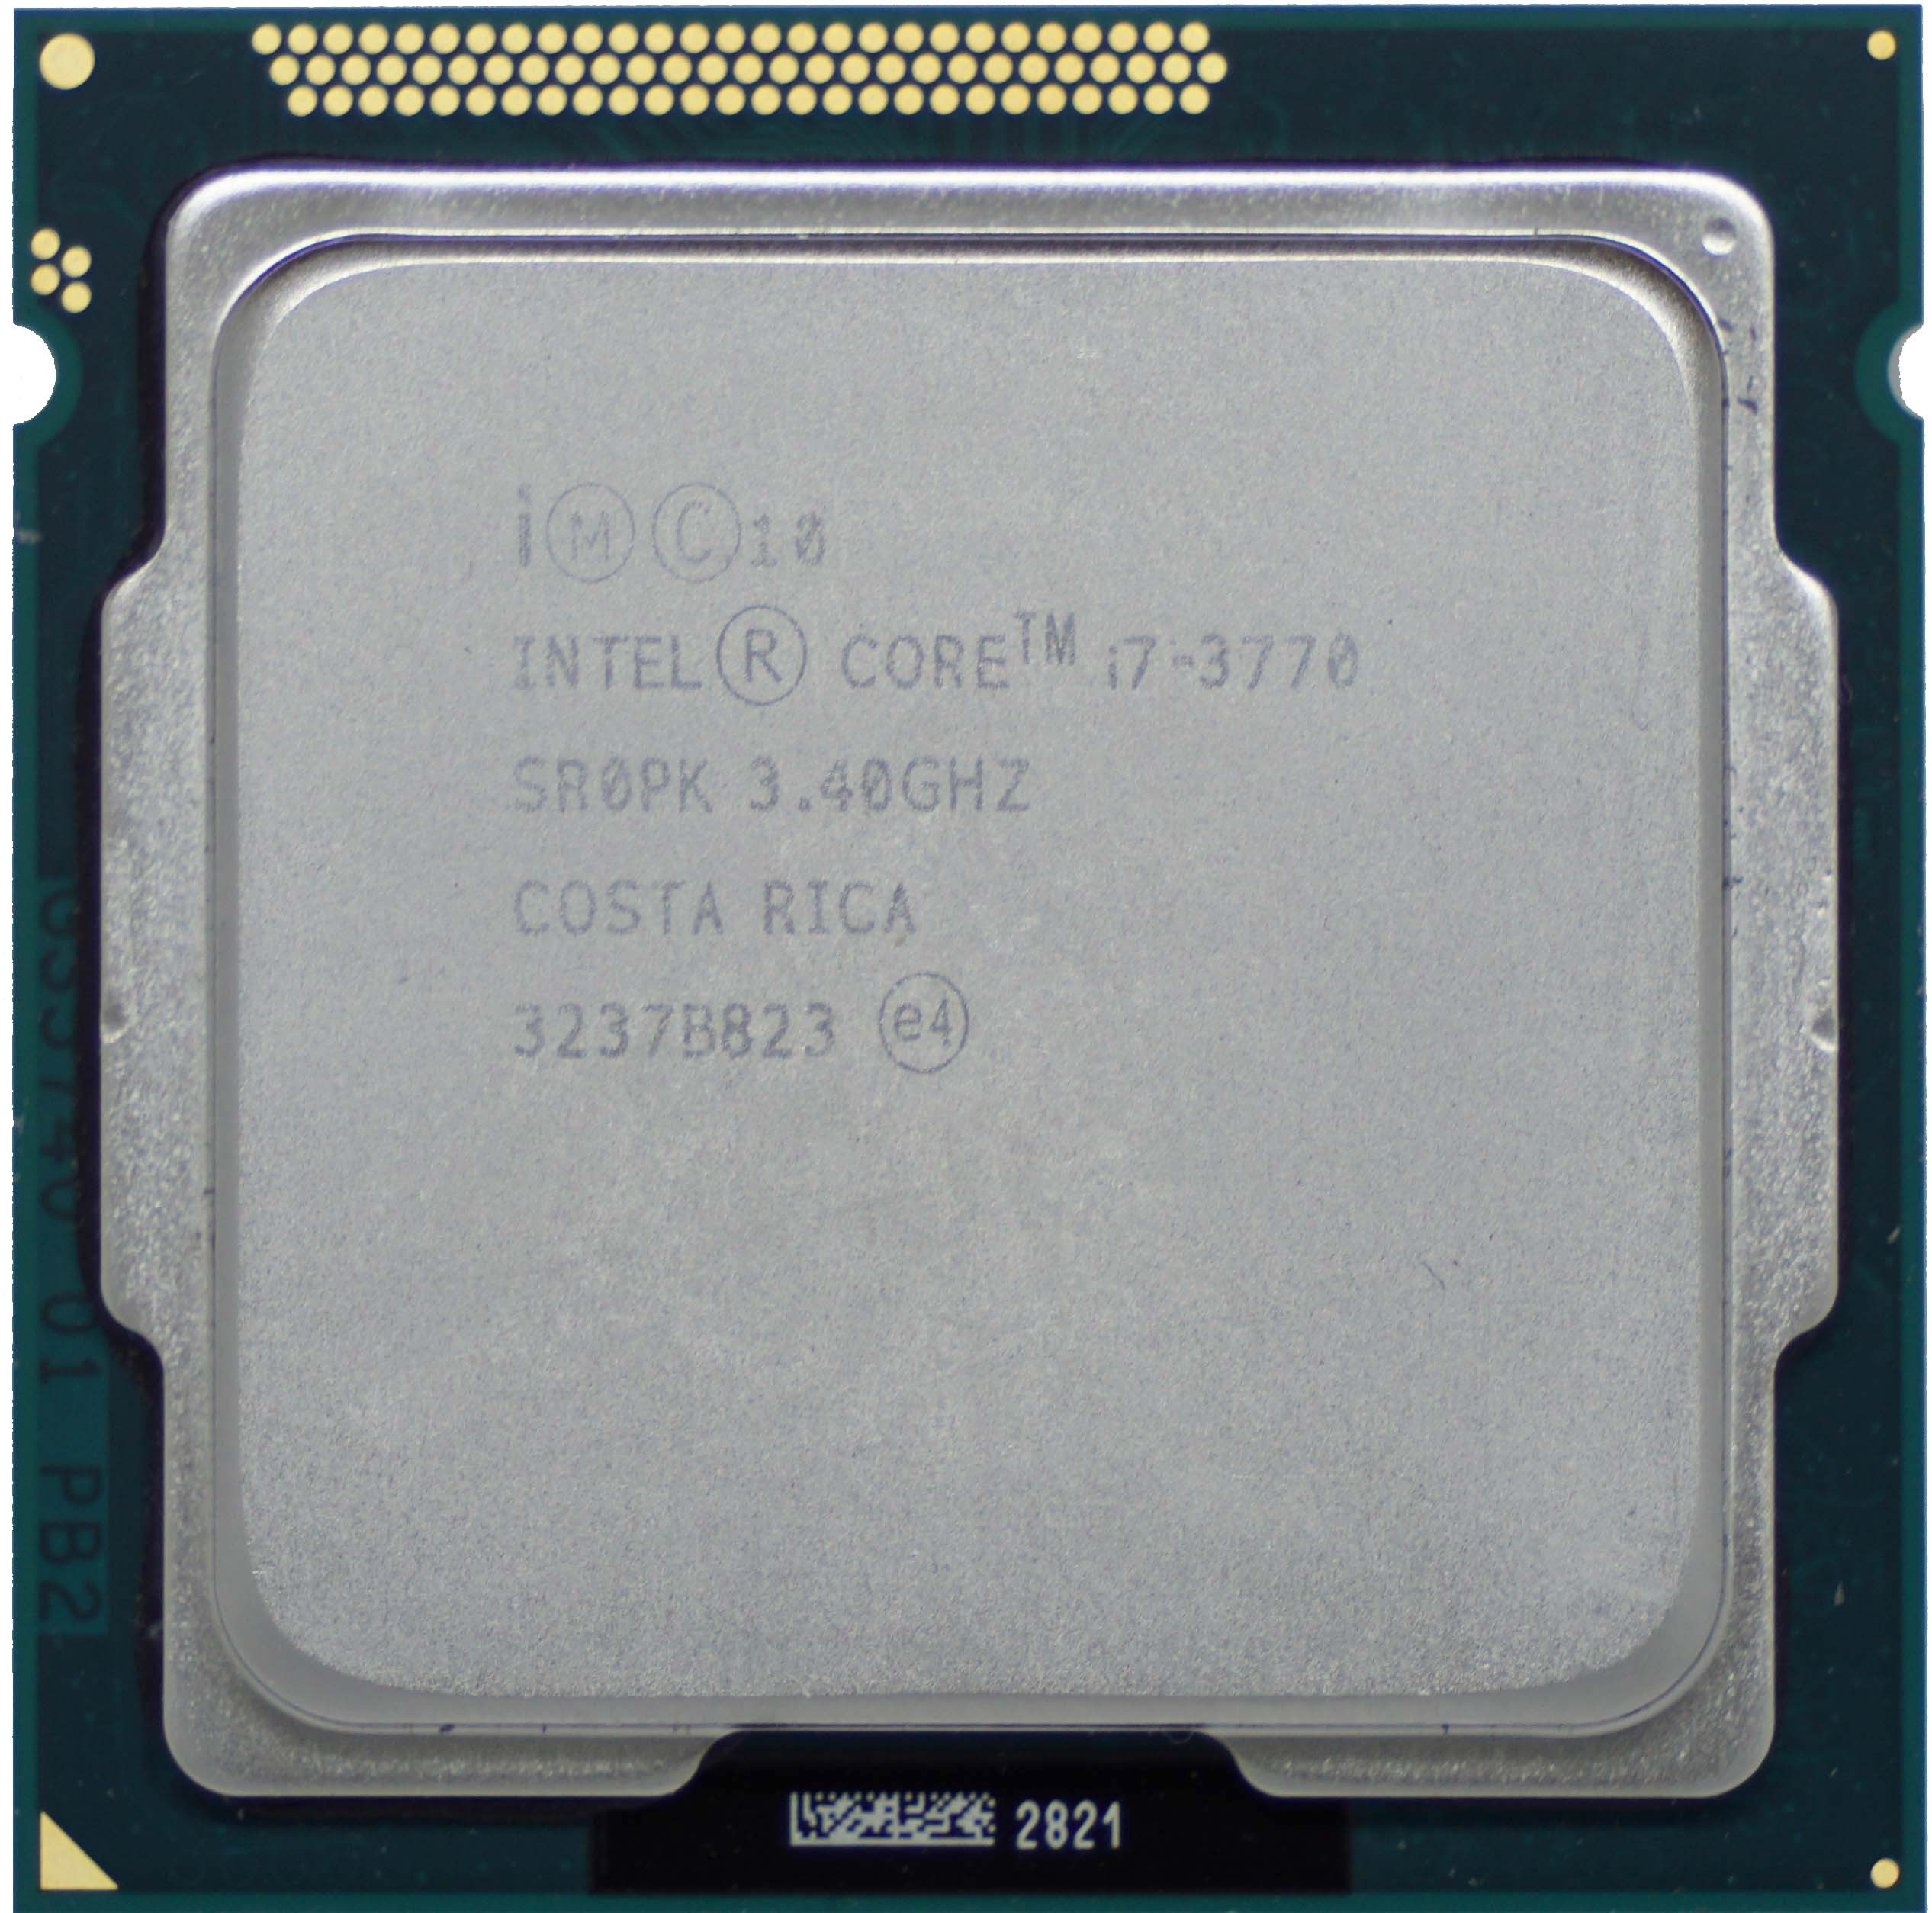 Intel Core i7-3770 (SR0PK) 3 40Ghz Quad (4) Core LGA1155 77W CPU